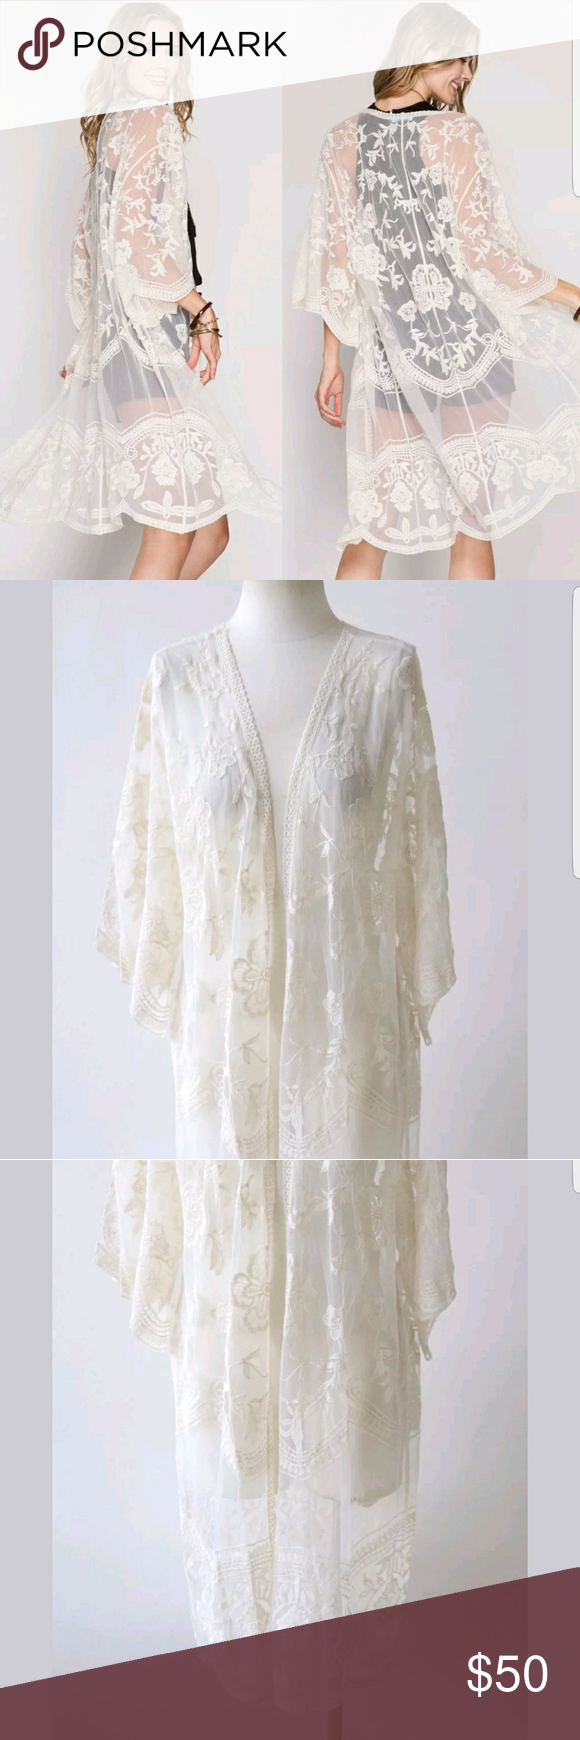 Cream lace kimono duster cardigan NWT | Lace kimono, Dusters and ...